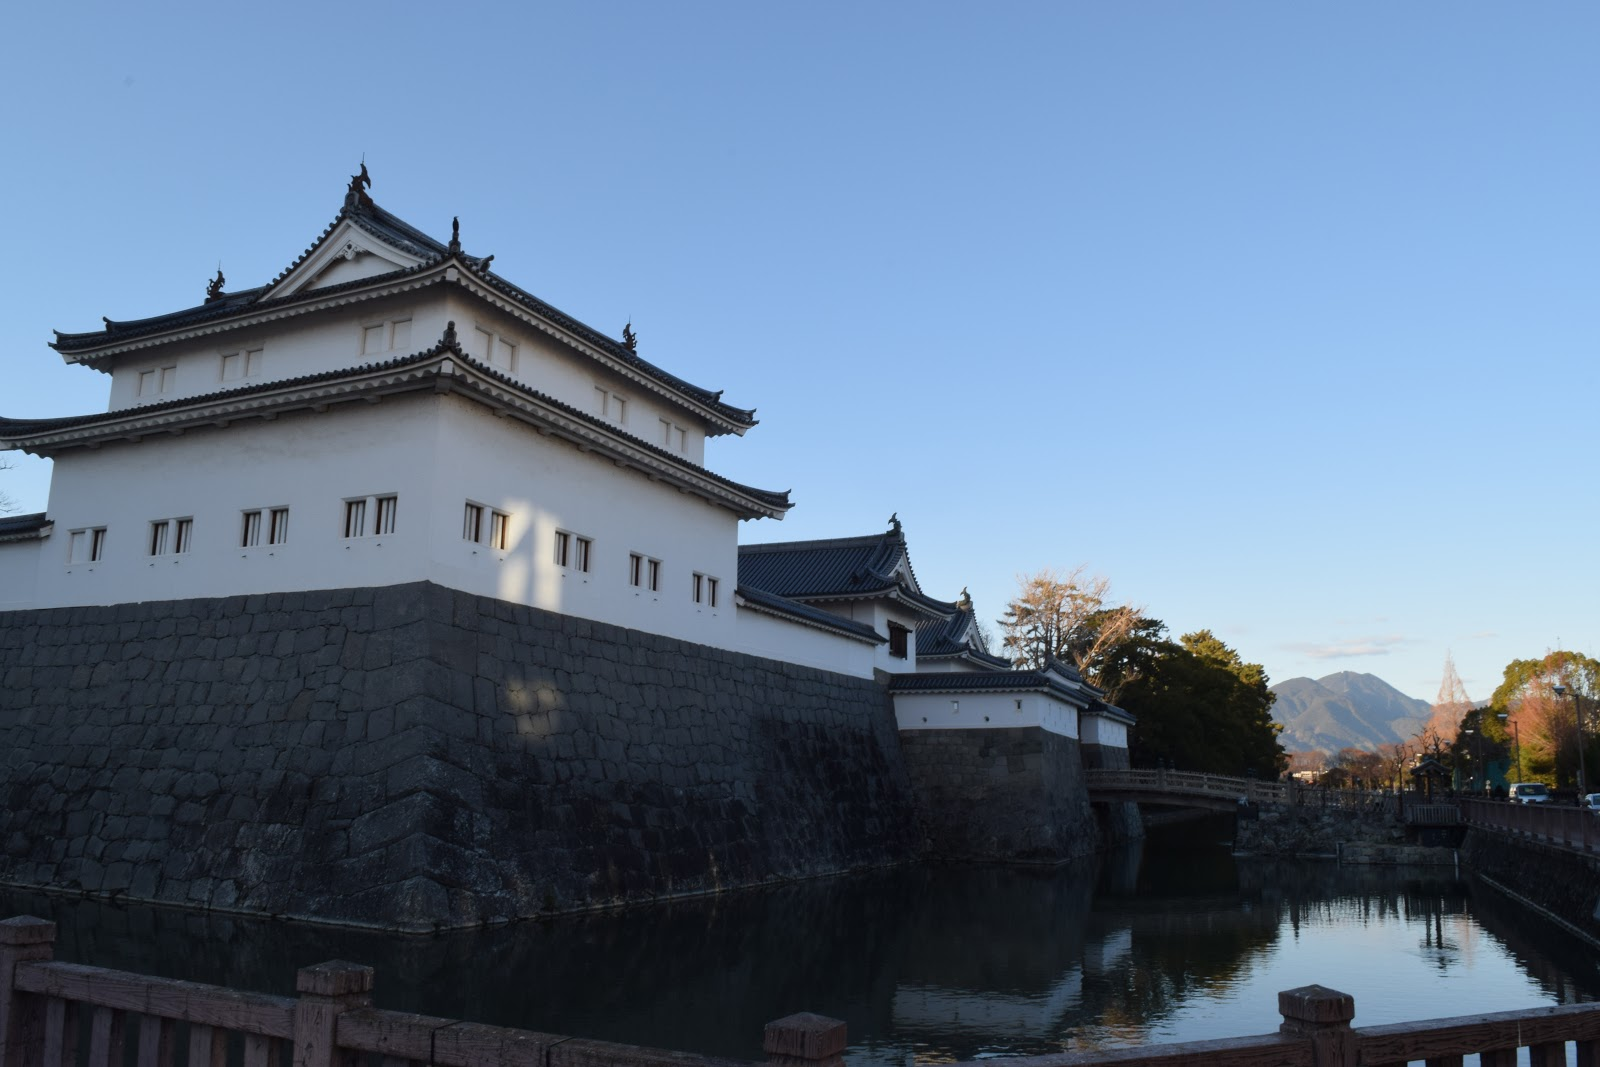 The wall of Sunpu Castle in Shizuoka city